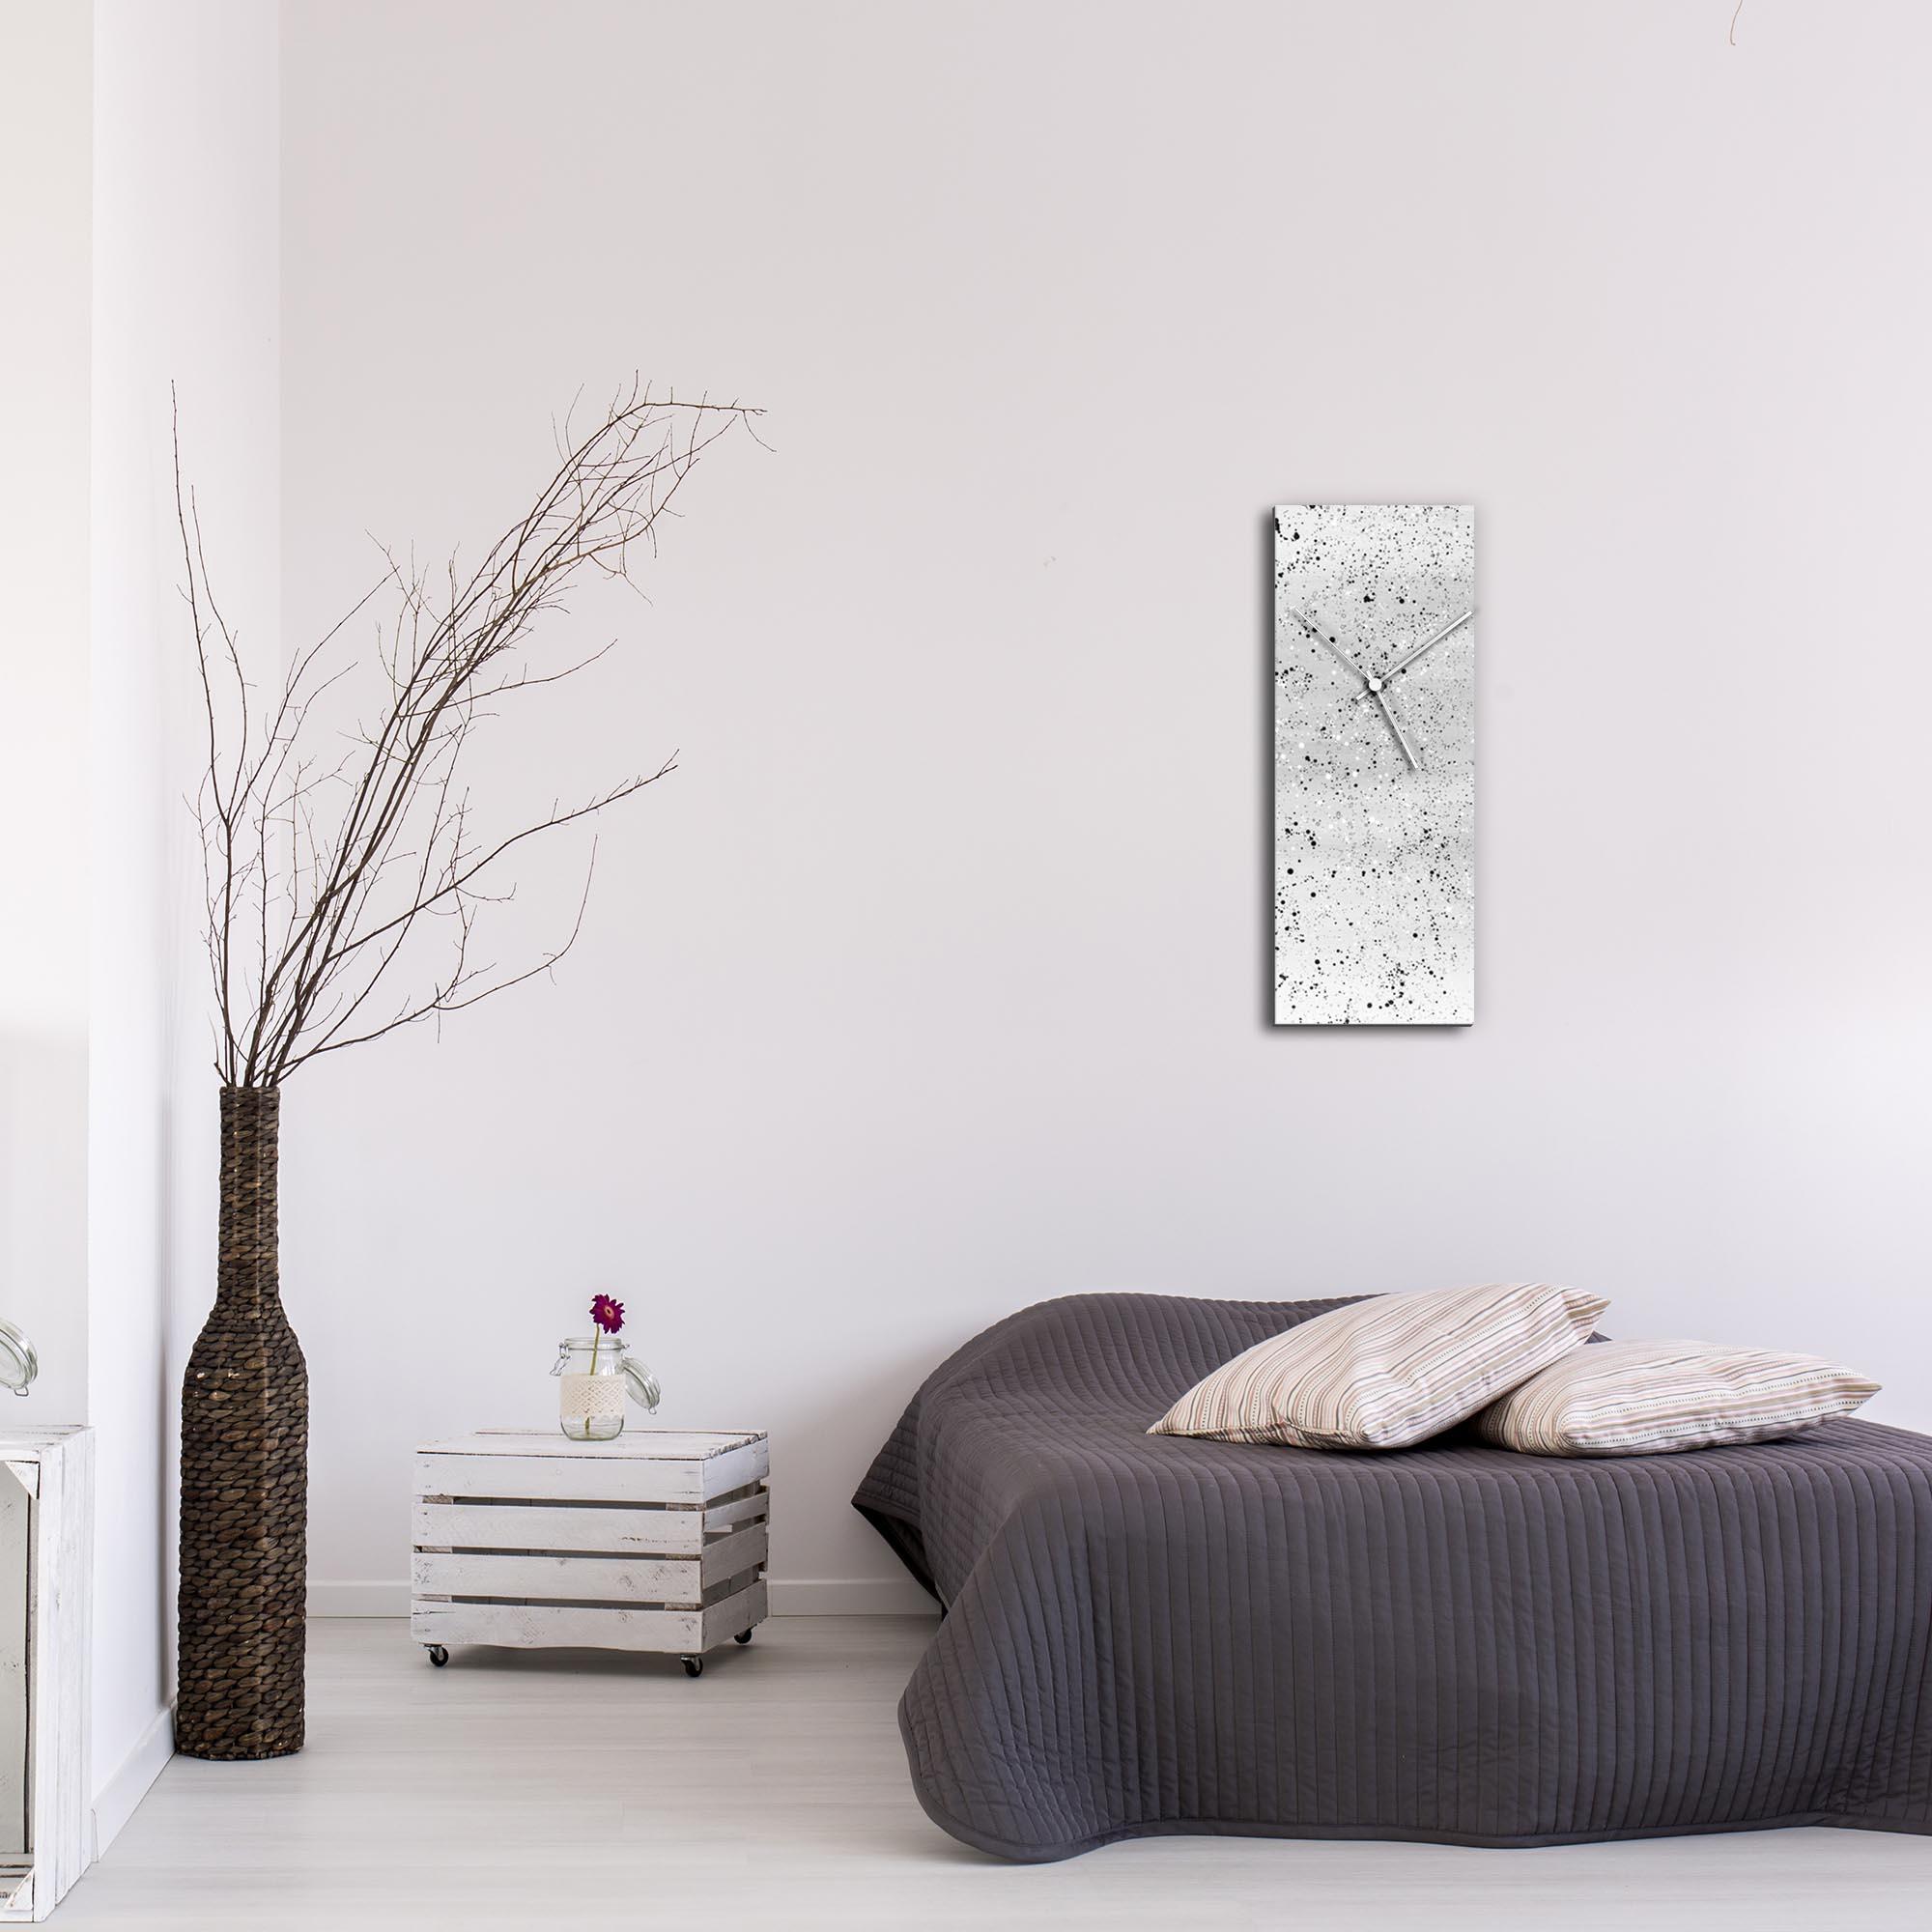 White Flecked Clock Large by Mendo Vasilevski - Urban Abstract Home Decor - Lifestyle View